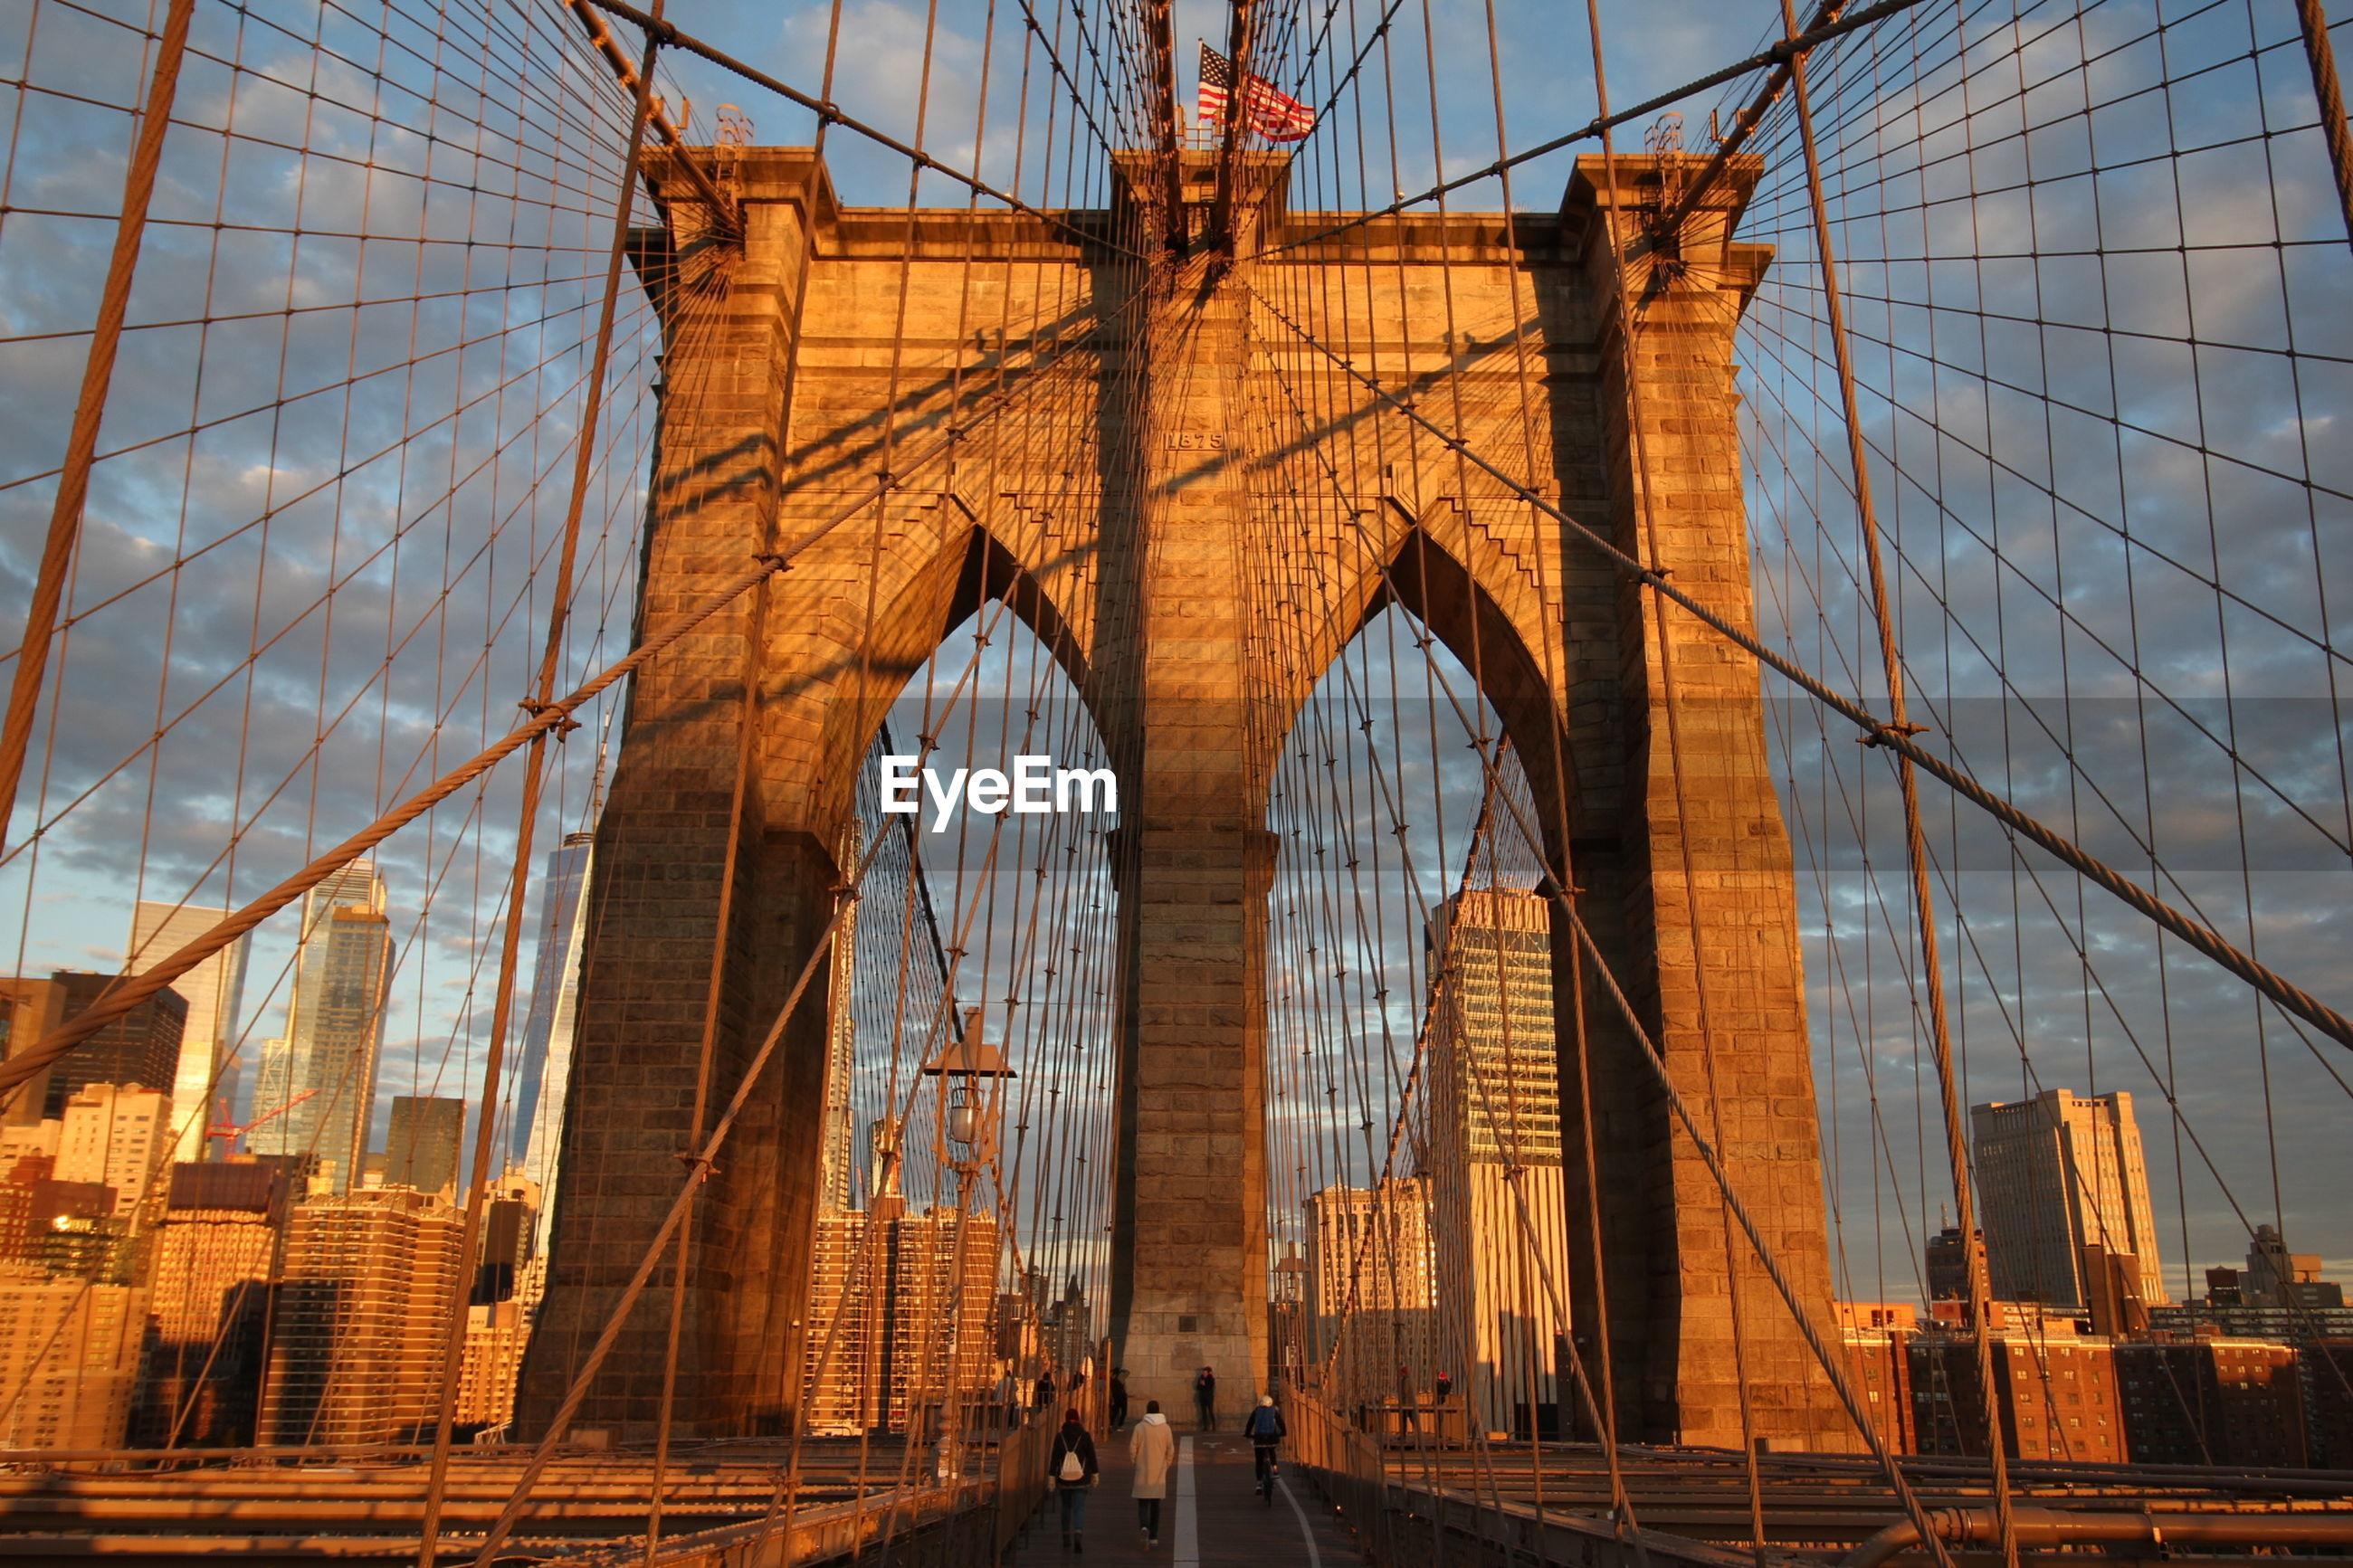 LOW ANGLE VIEW OF SUSPENSION BRIDGE AGAINST CITYSCAPE